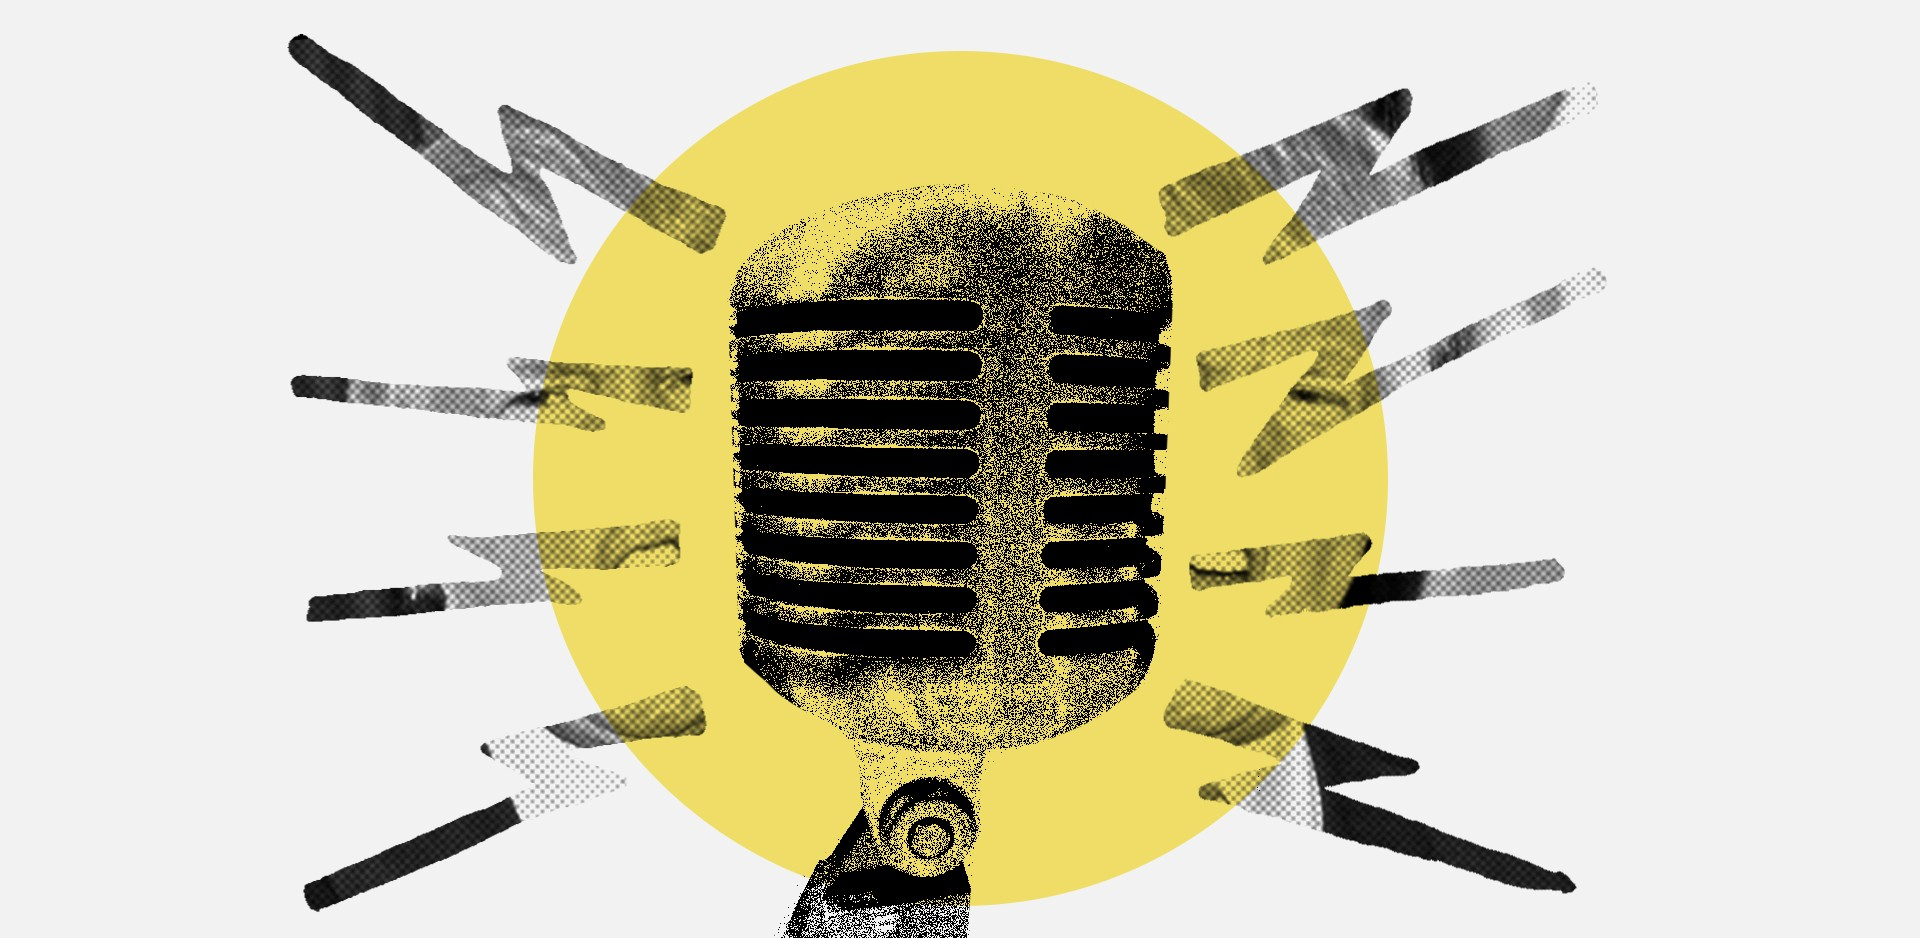 A radio microphone emitting radio waves in Trump's likeness